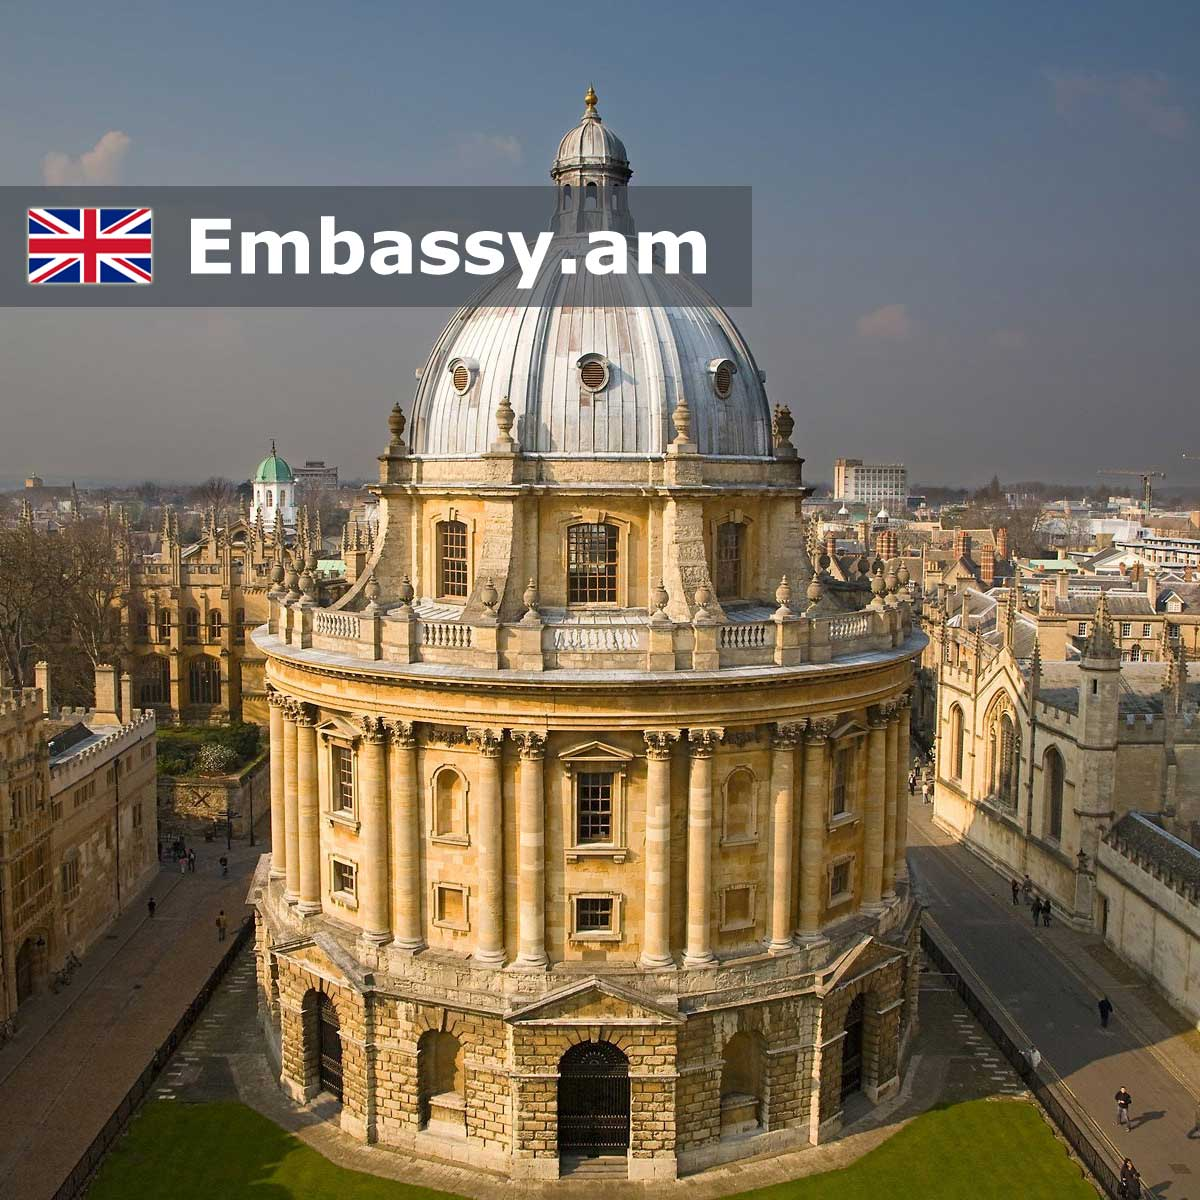 Oxford - Hotels in United Kingdom - Embassy.am